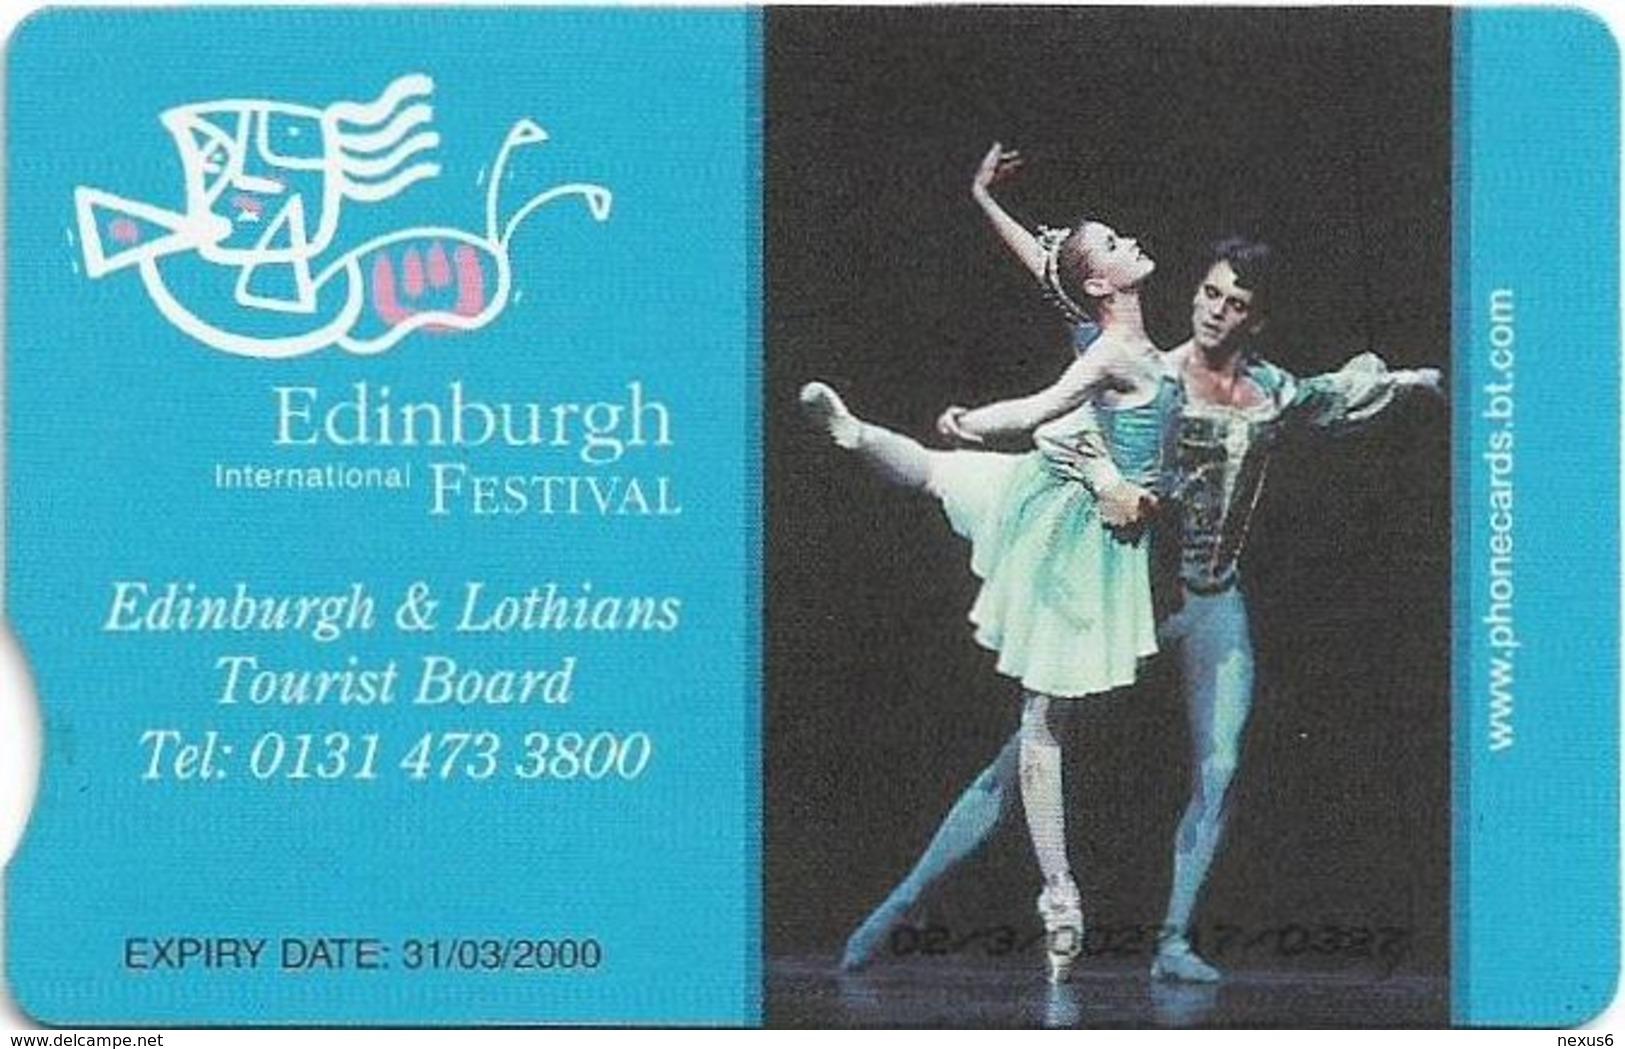 UK - BT (Chip) - BCC-143 - PRO401 - Glastonbury Festival 1998, 3£, 21.000ex, Used - Reino Unido